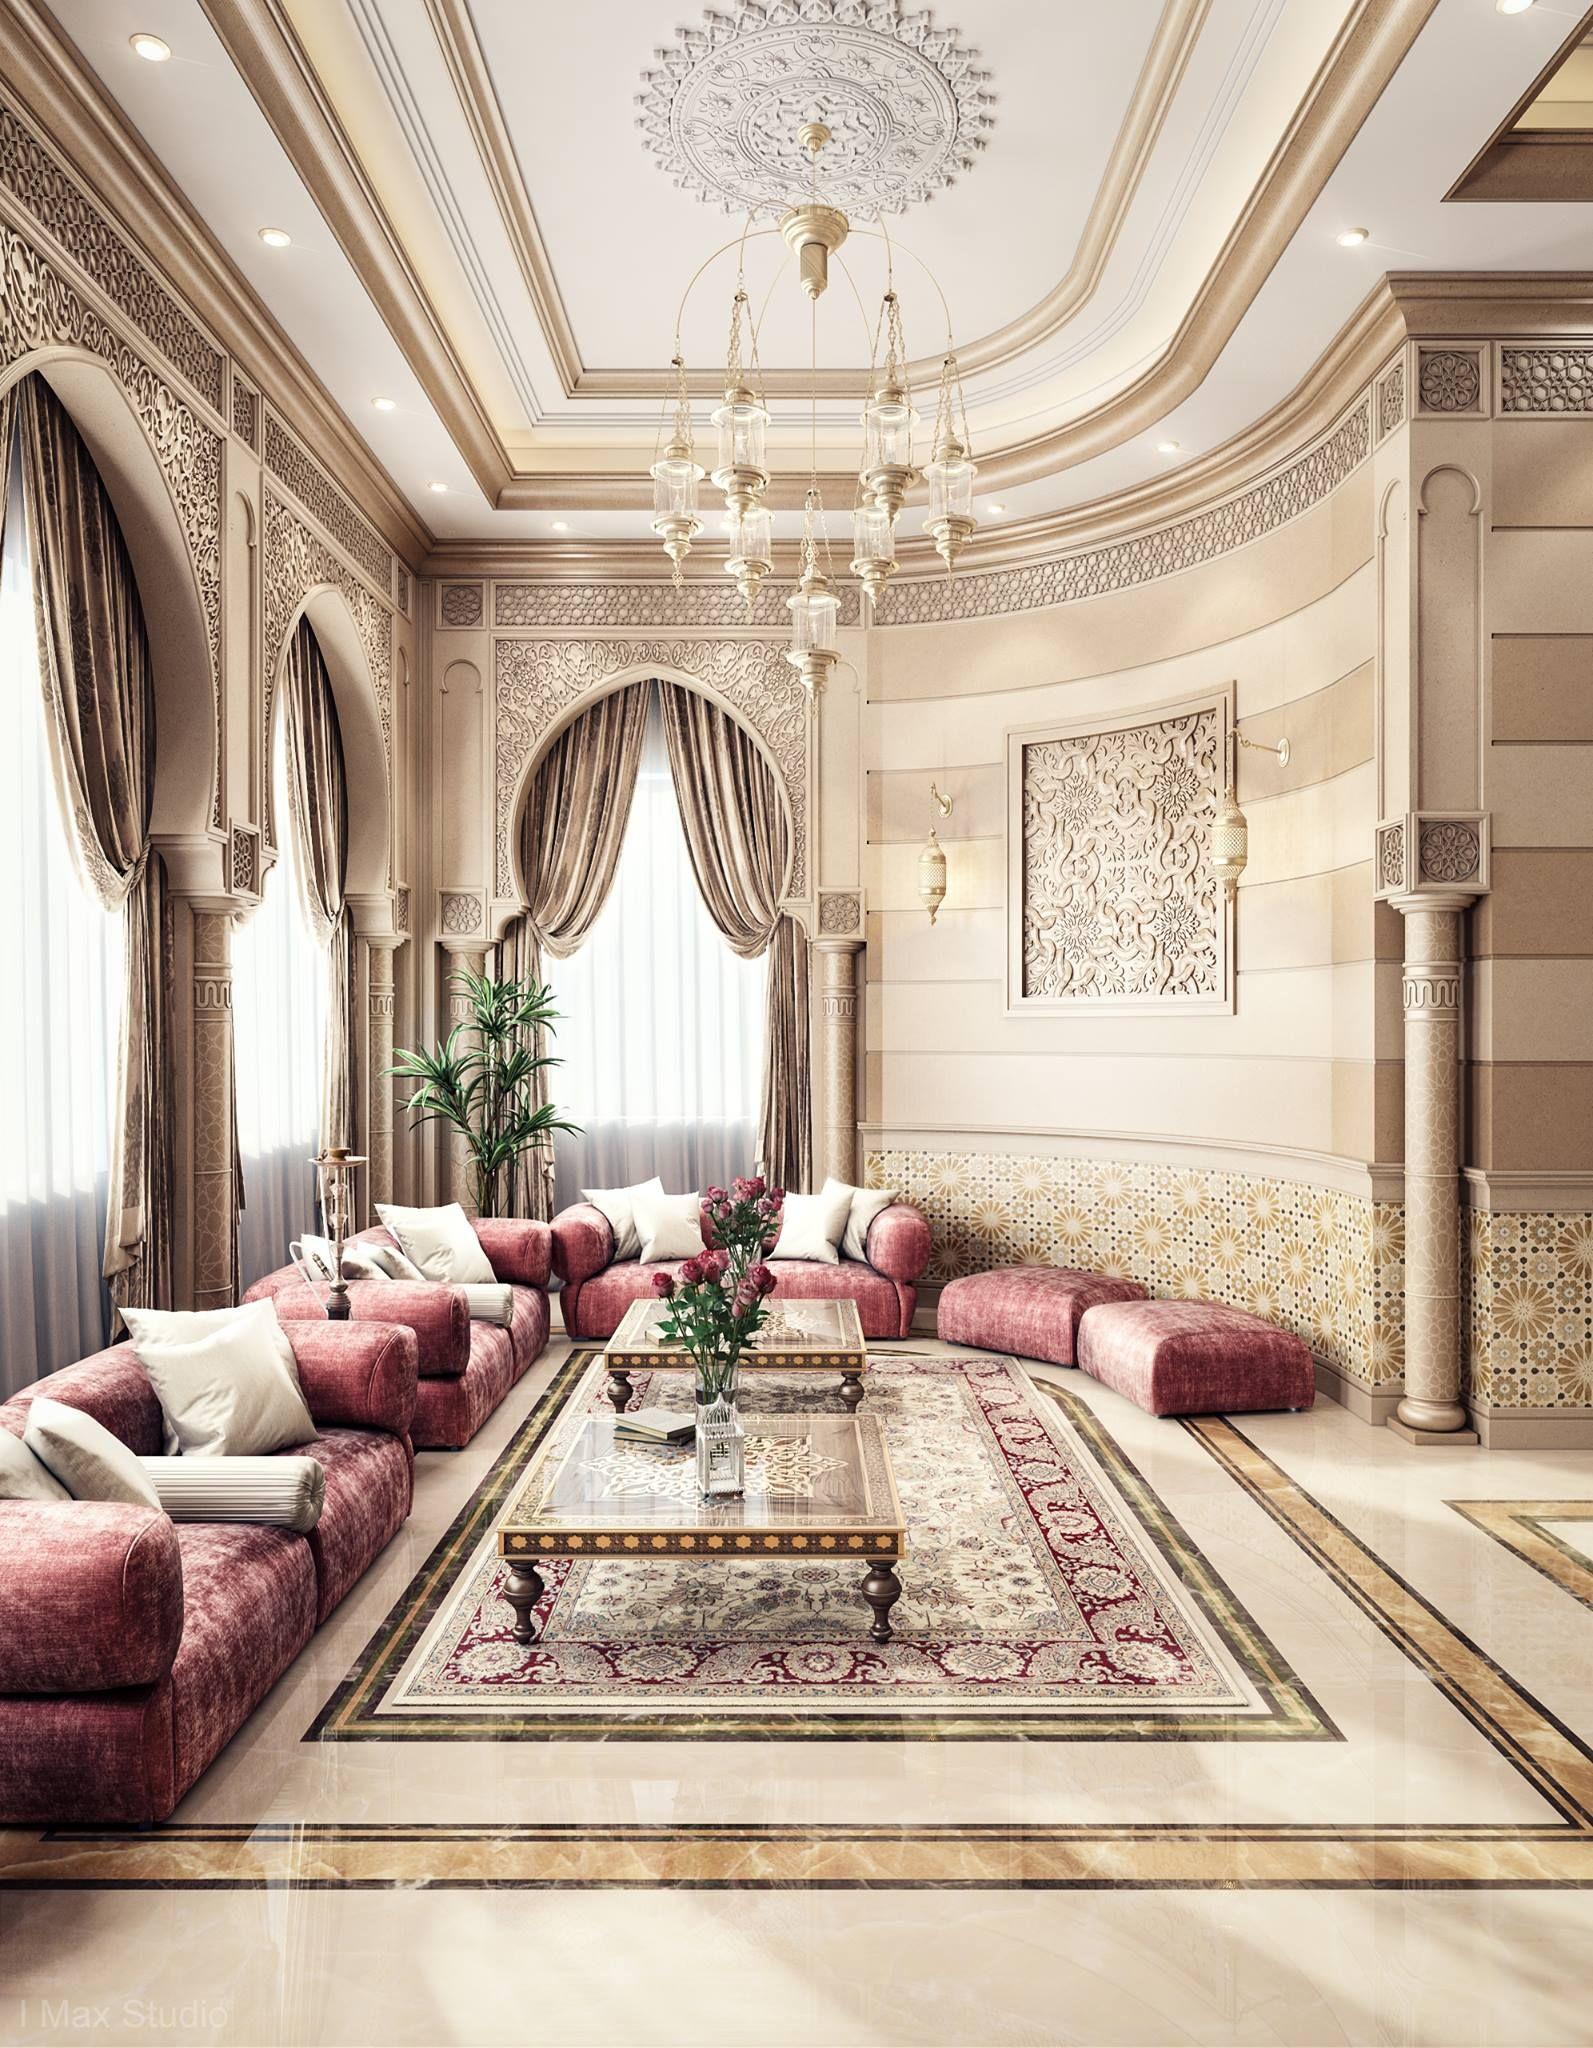 Magic Of Orient Moroccan Decor Living Room Arabian Living Room Luxury Living Room Moroccan living room designs